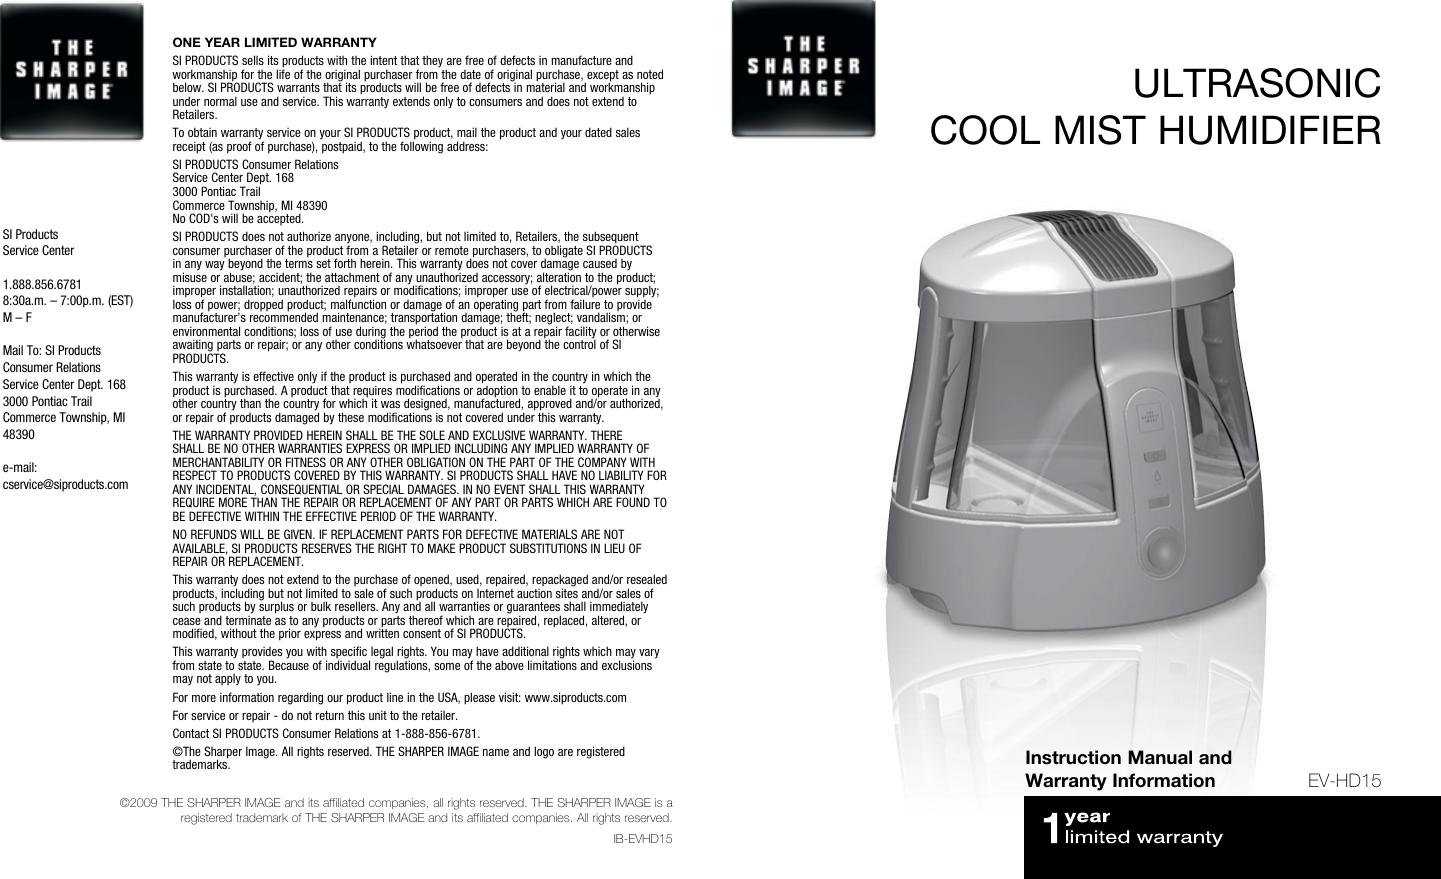 Homedics Ultrasonic Cool Mist Humidifier Instruction Manual Manual Guide